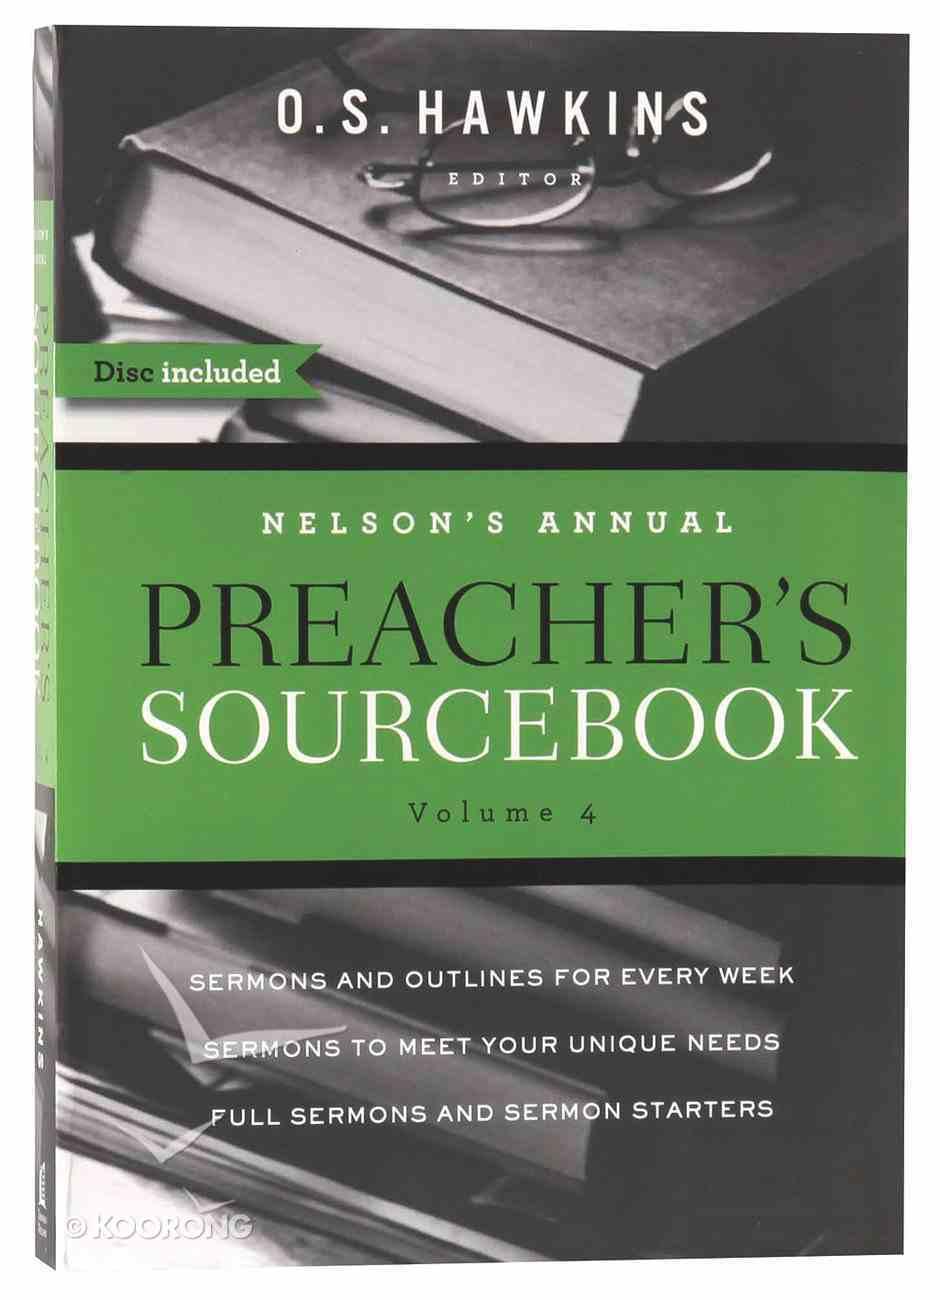 Nelson's Annual Preacher's Sourcebook (Volume 4) Paperback